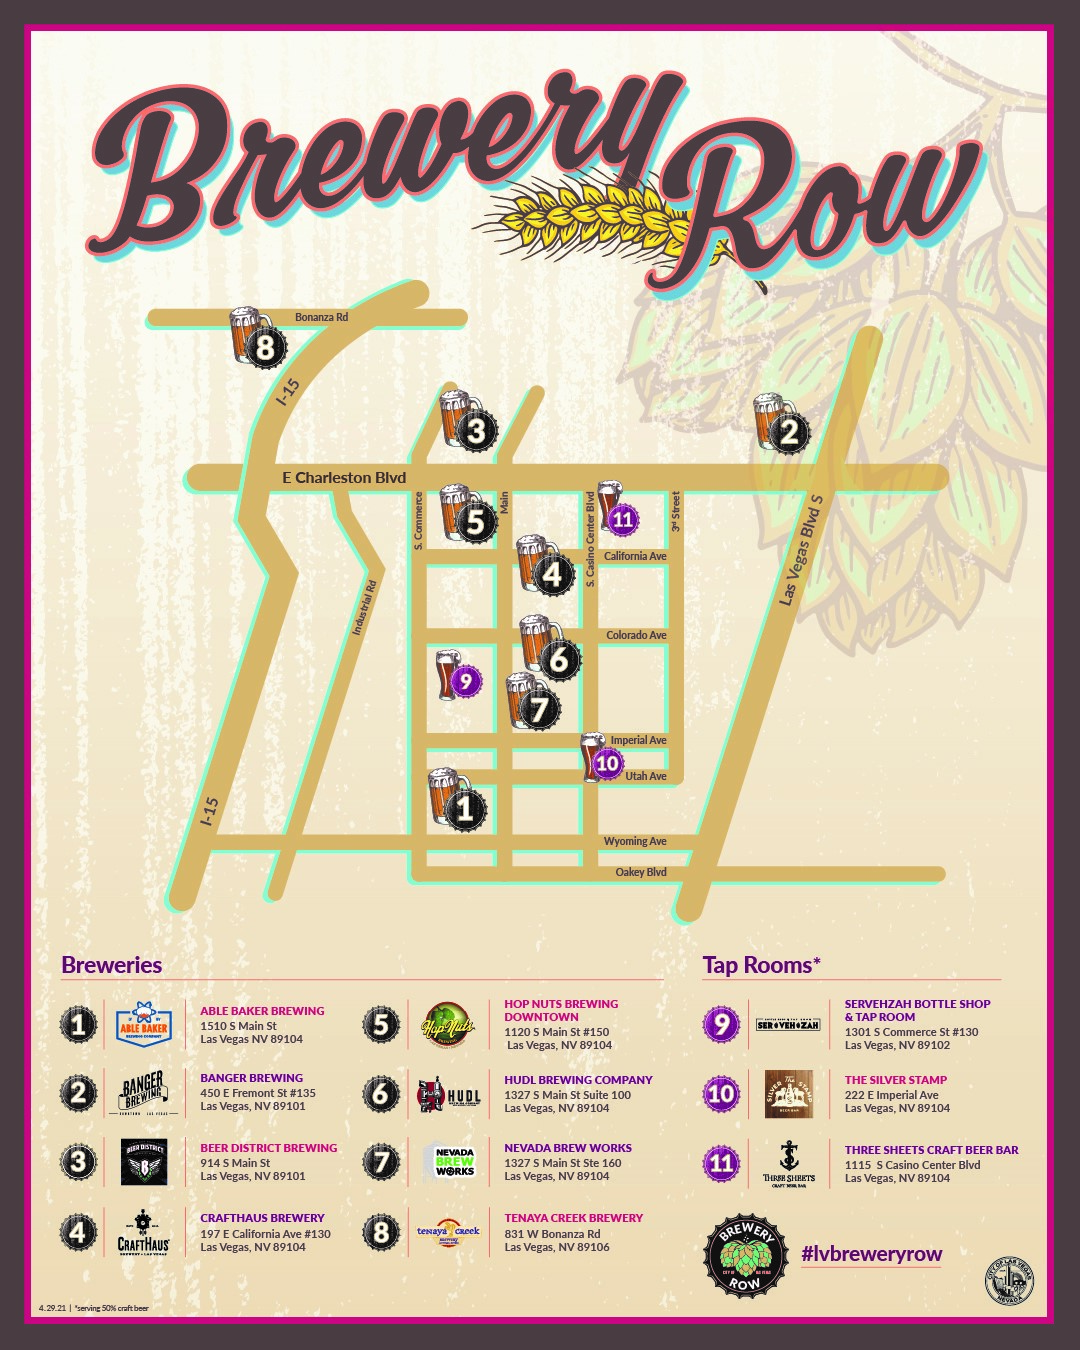 Brewery Row Map 4-29-21.jpg